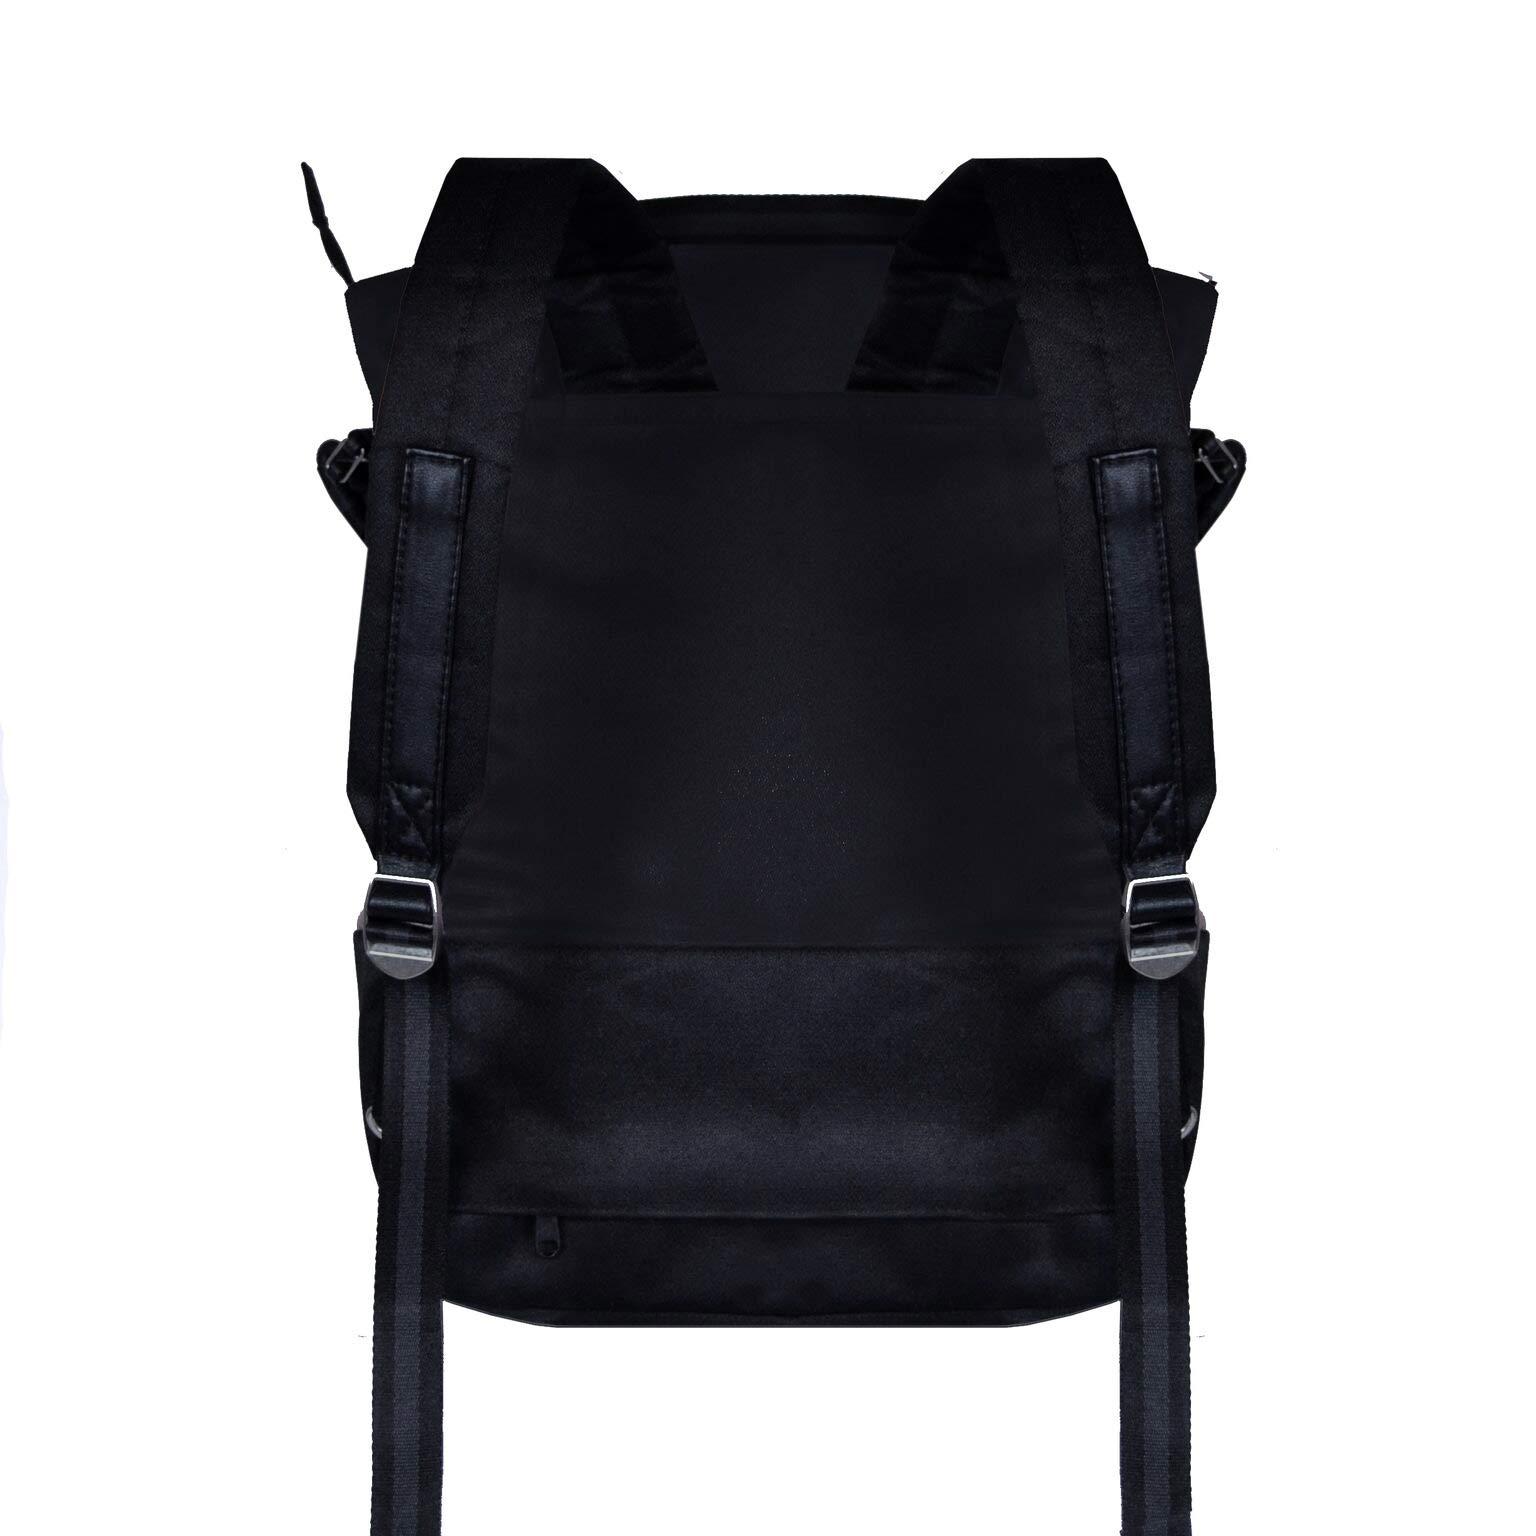 Sherpani Camden Raven Laptop Backpack, Raven by Sherpani (Image #5)